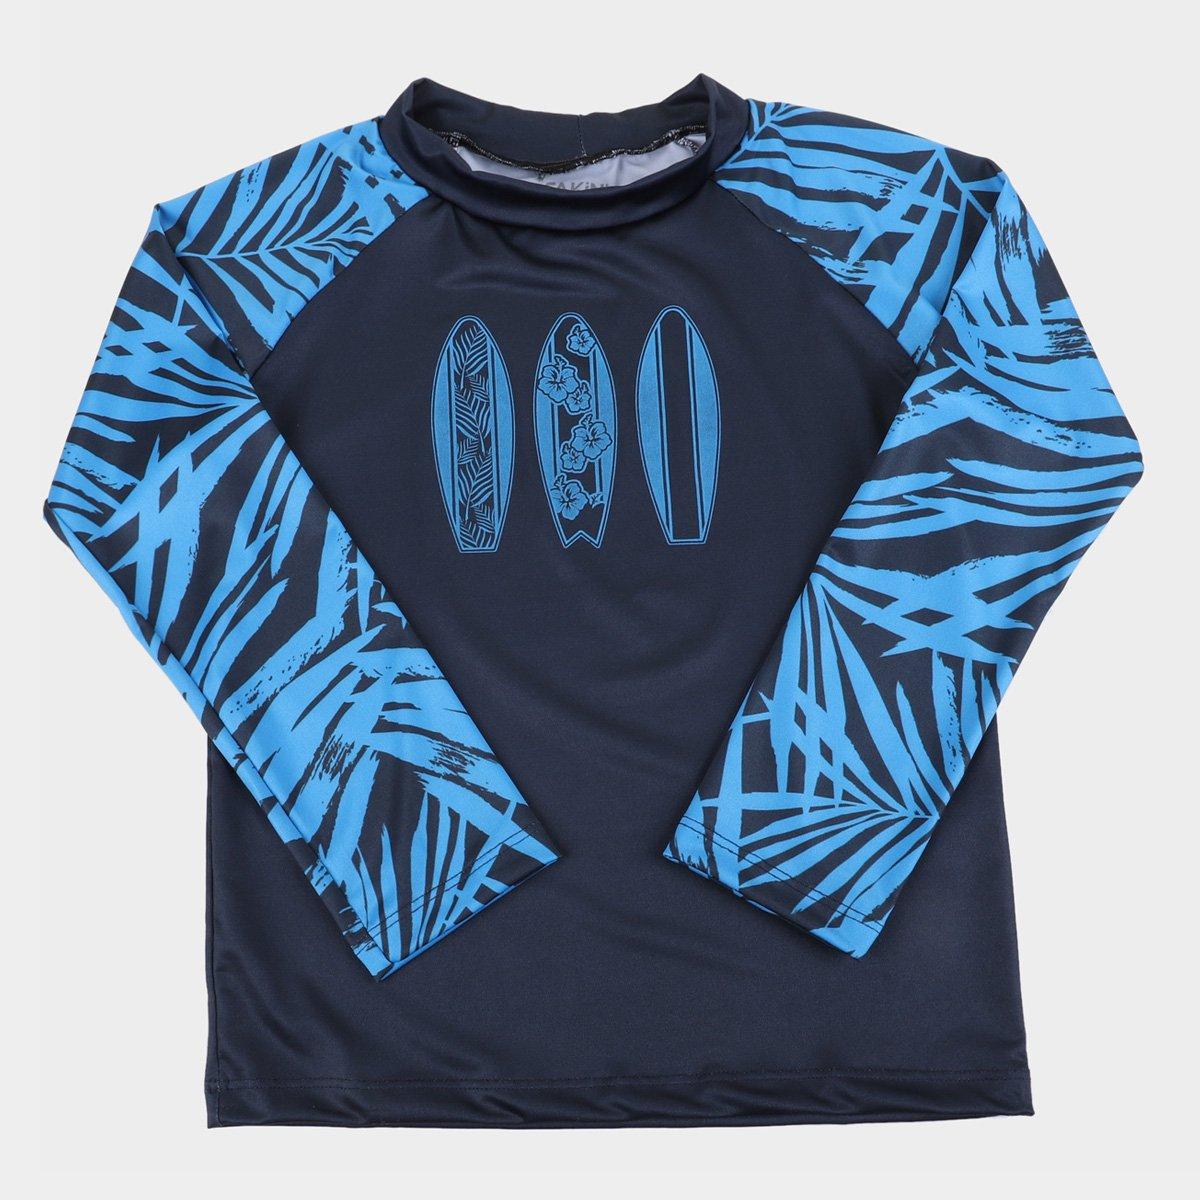 Camiseta Infantil Fakini Praia Manga Longa Proteção UV 50+ Masculina